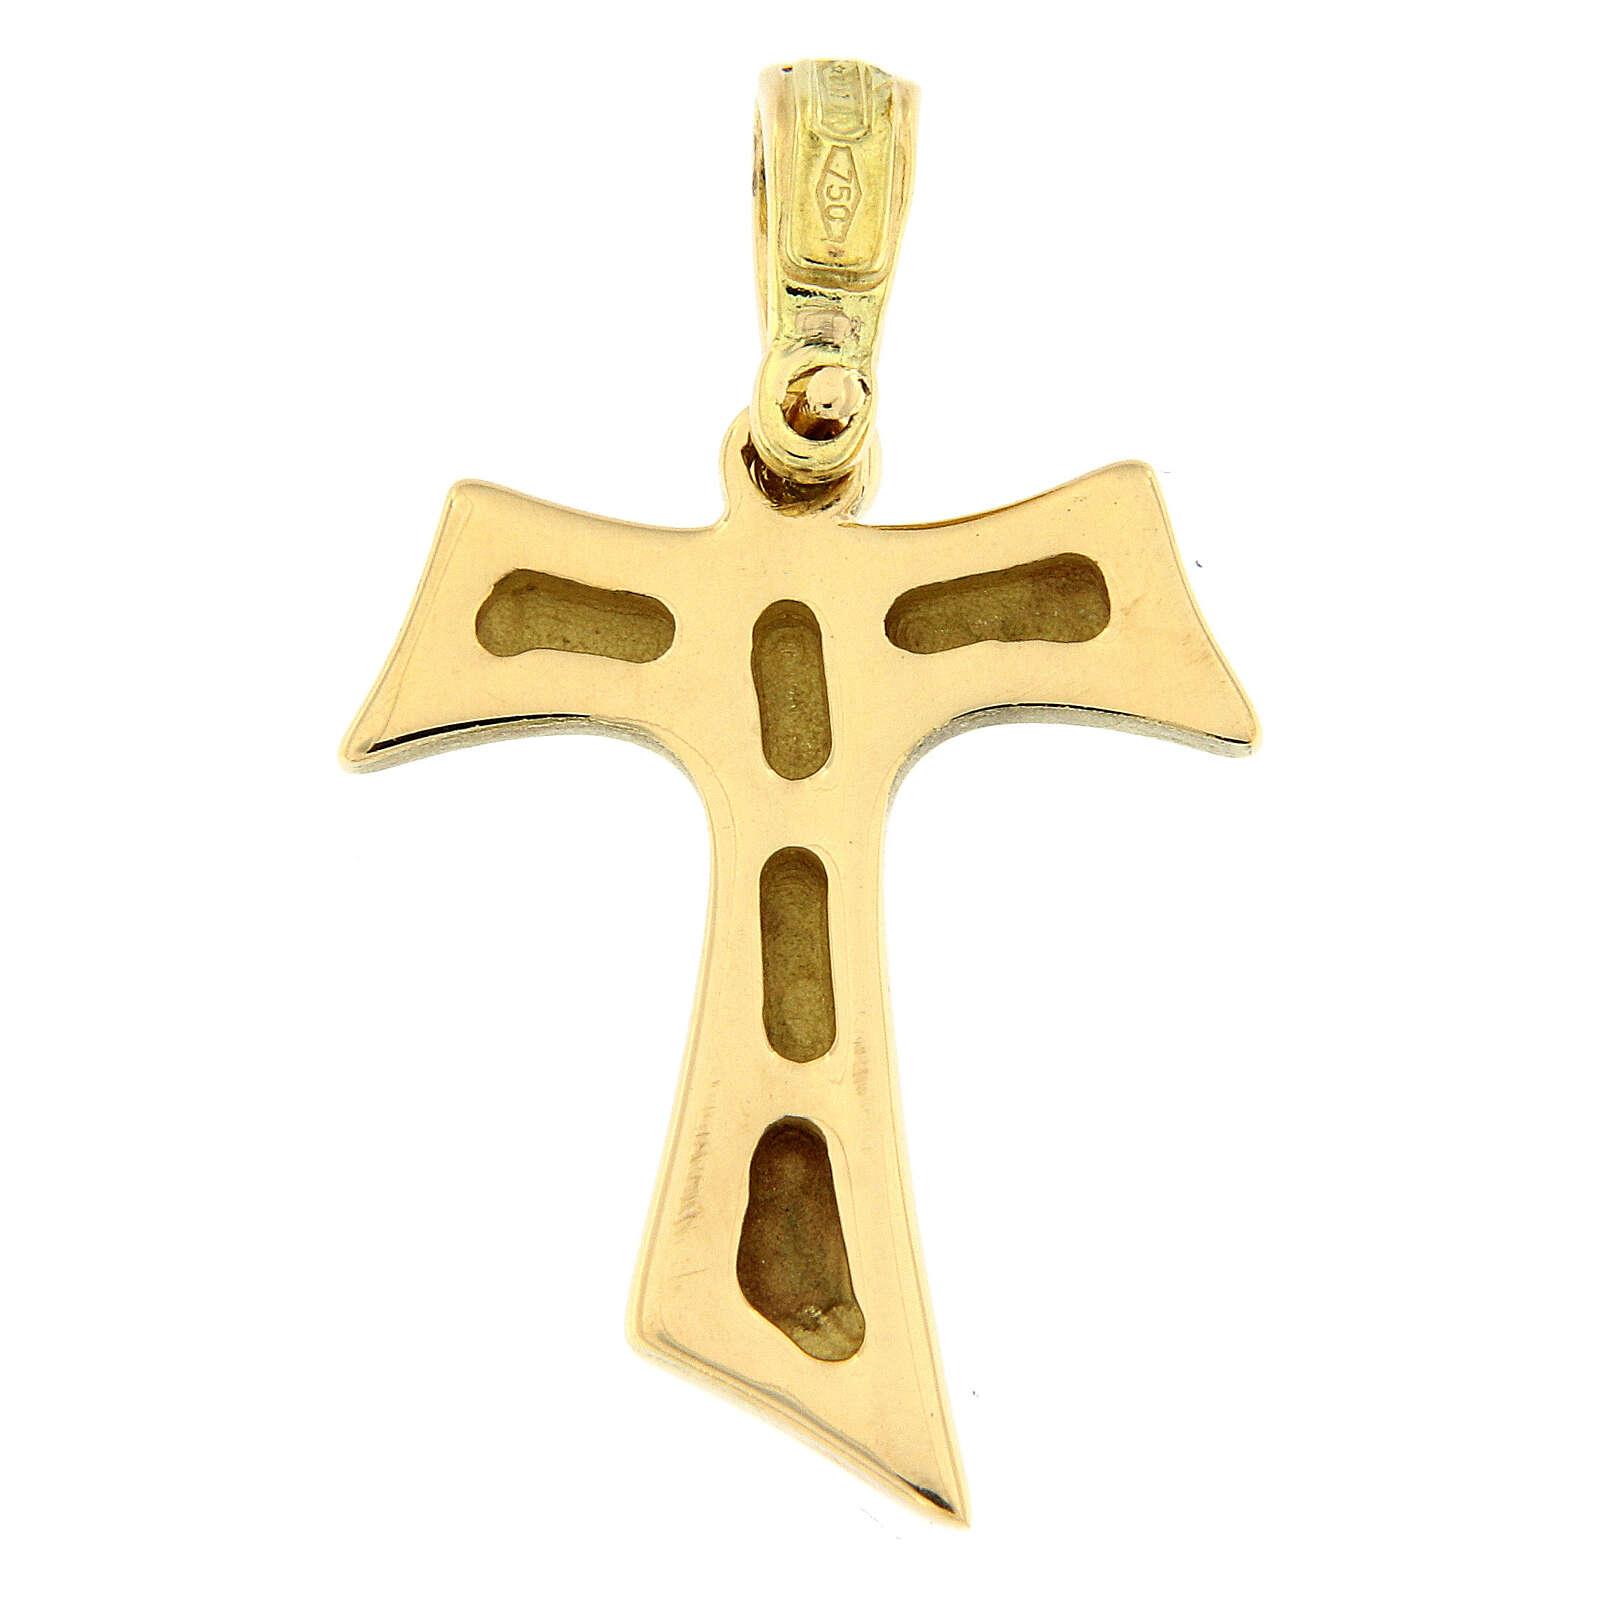 Croce Tau oro lucido 18 carati 2,1 gr 4